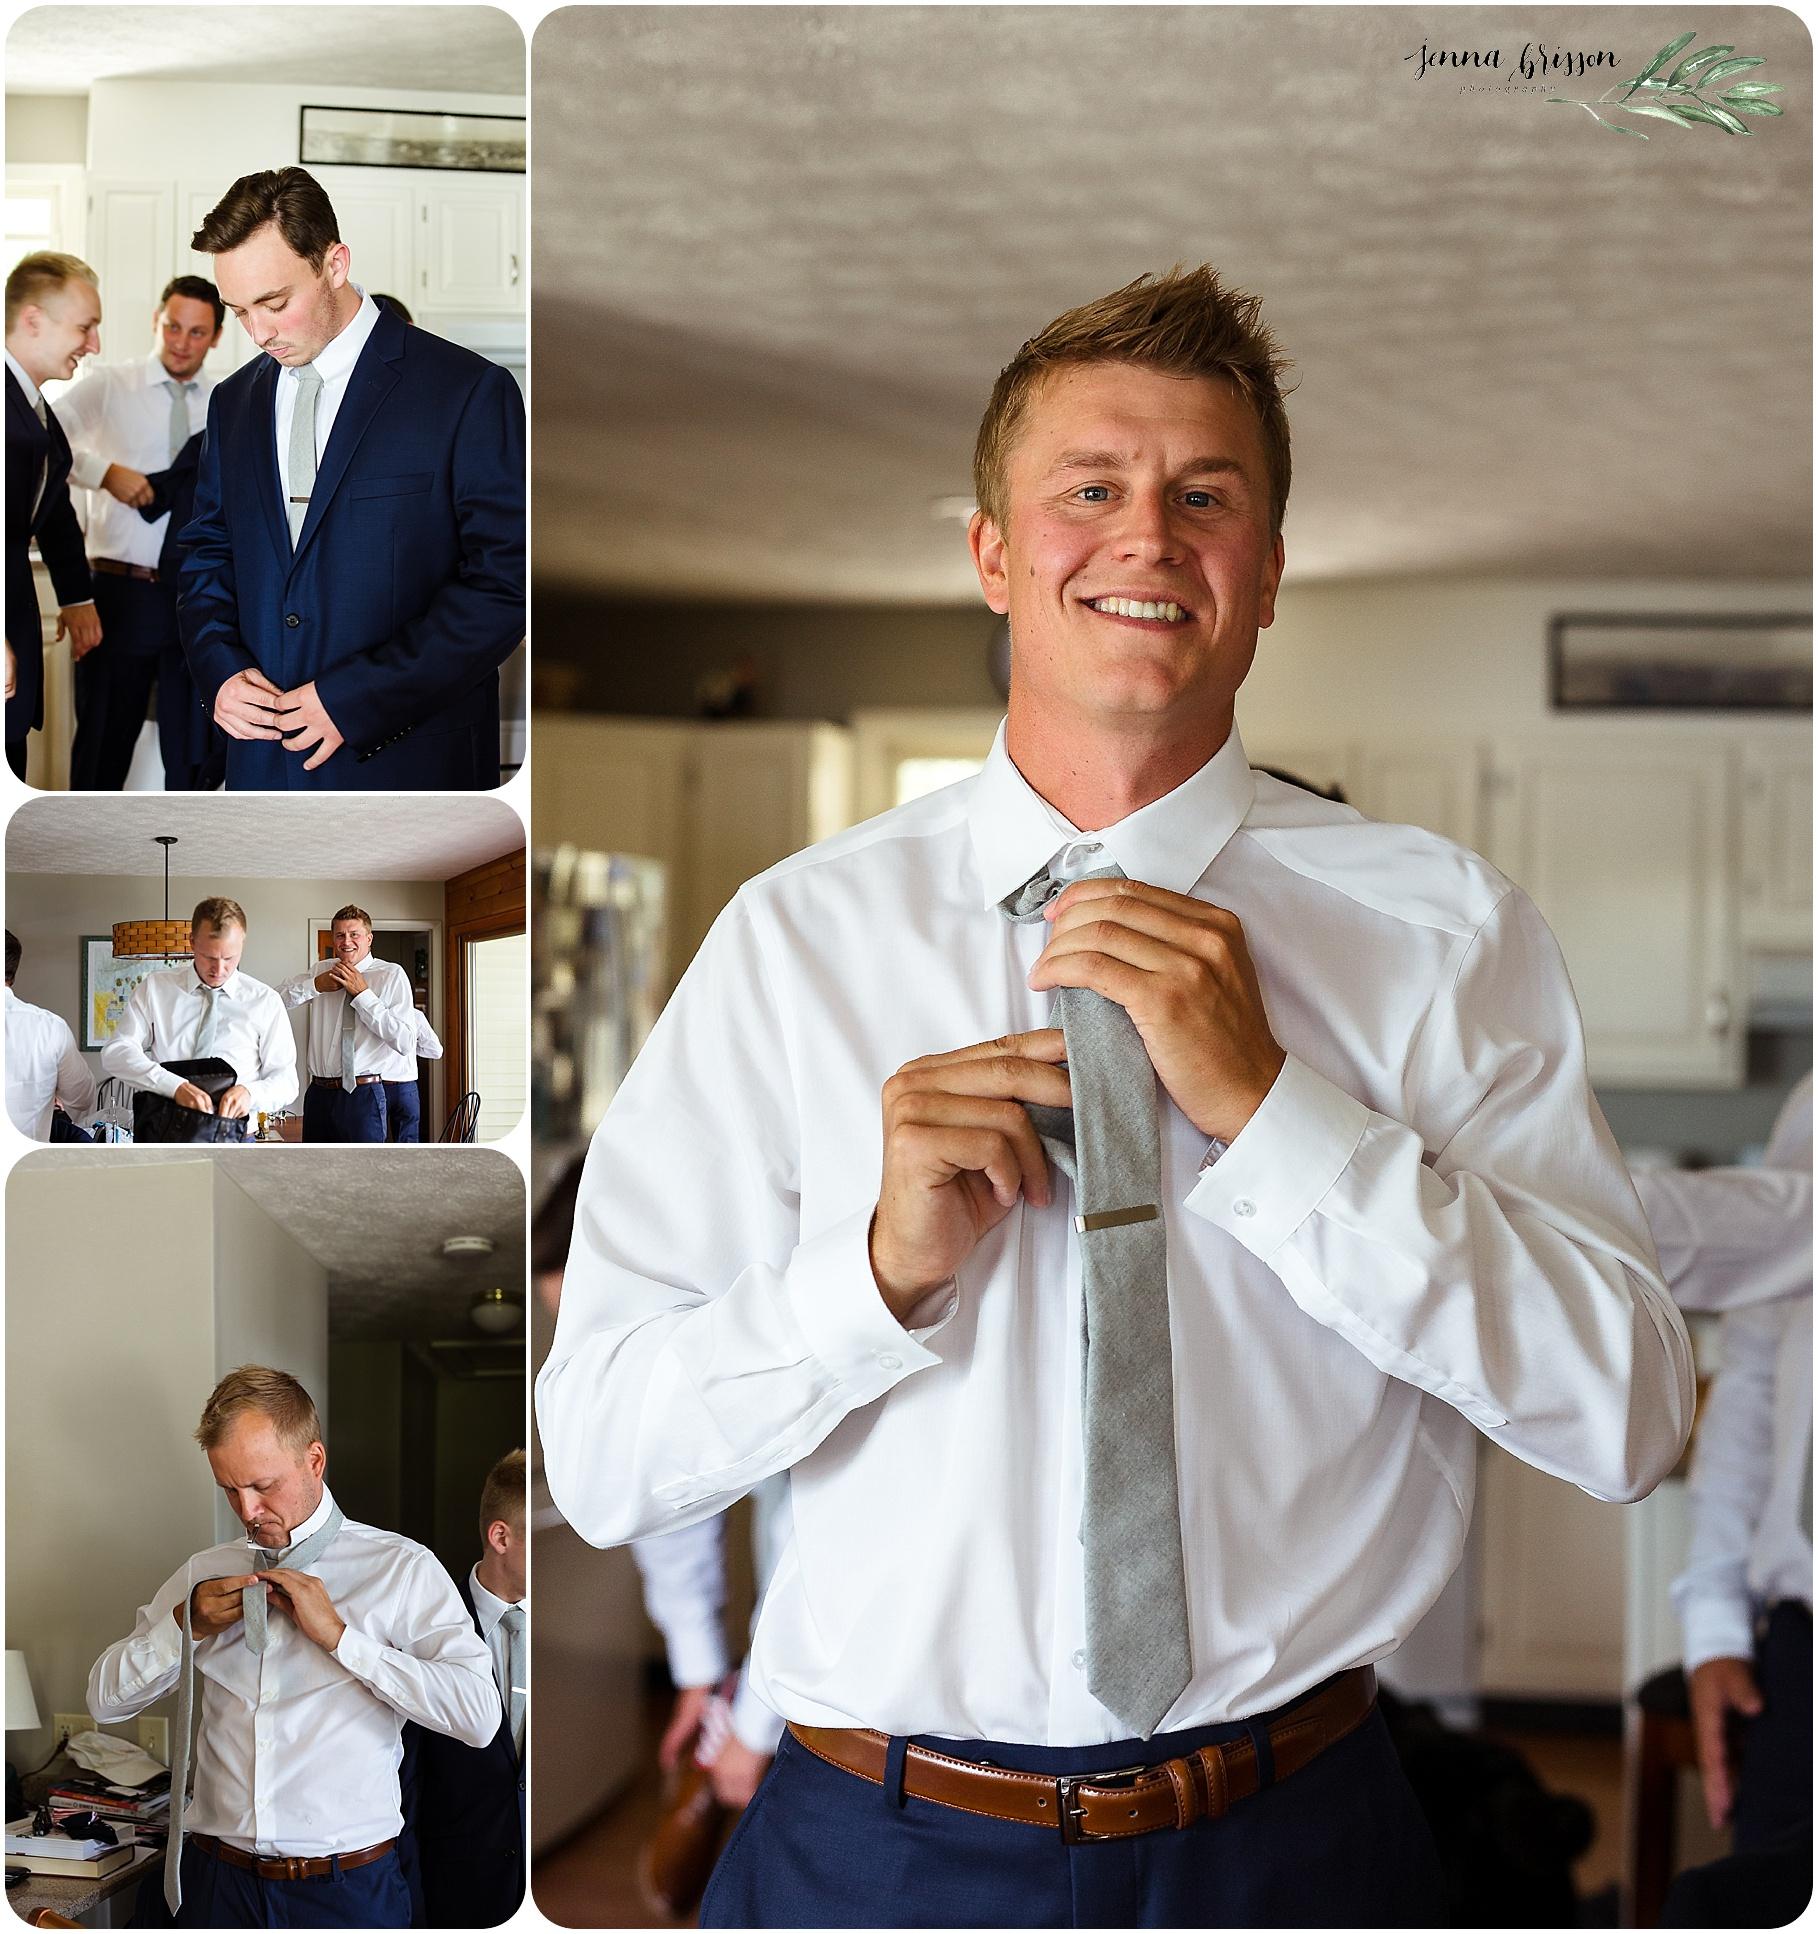 Groom Getting Ready - Vermont Wedding Photographer Jenna Brisson